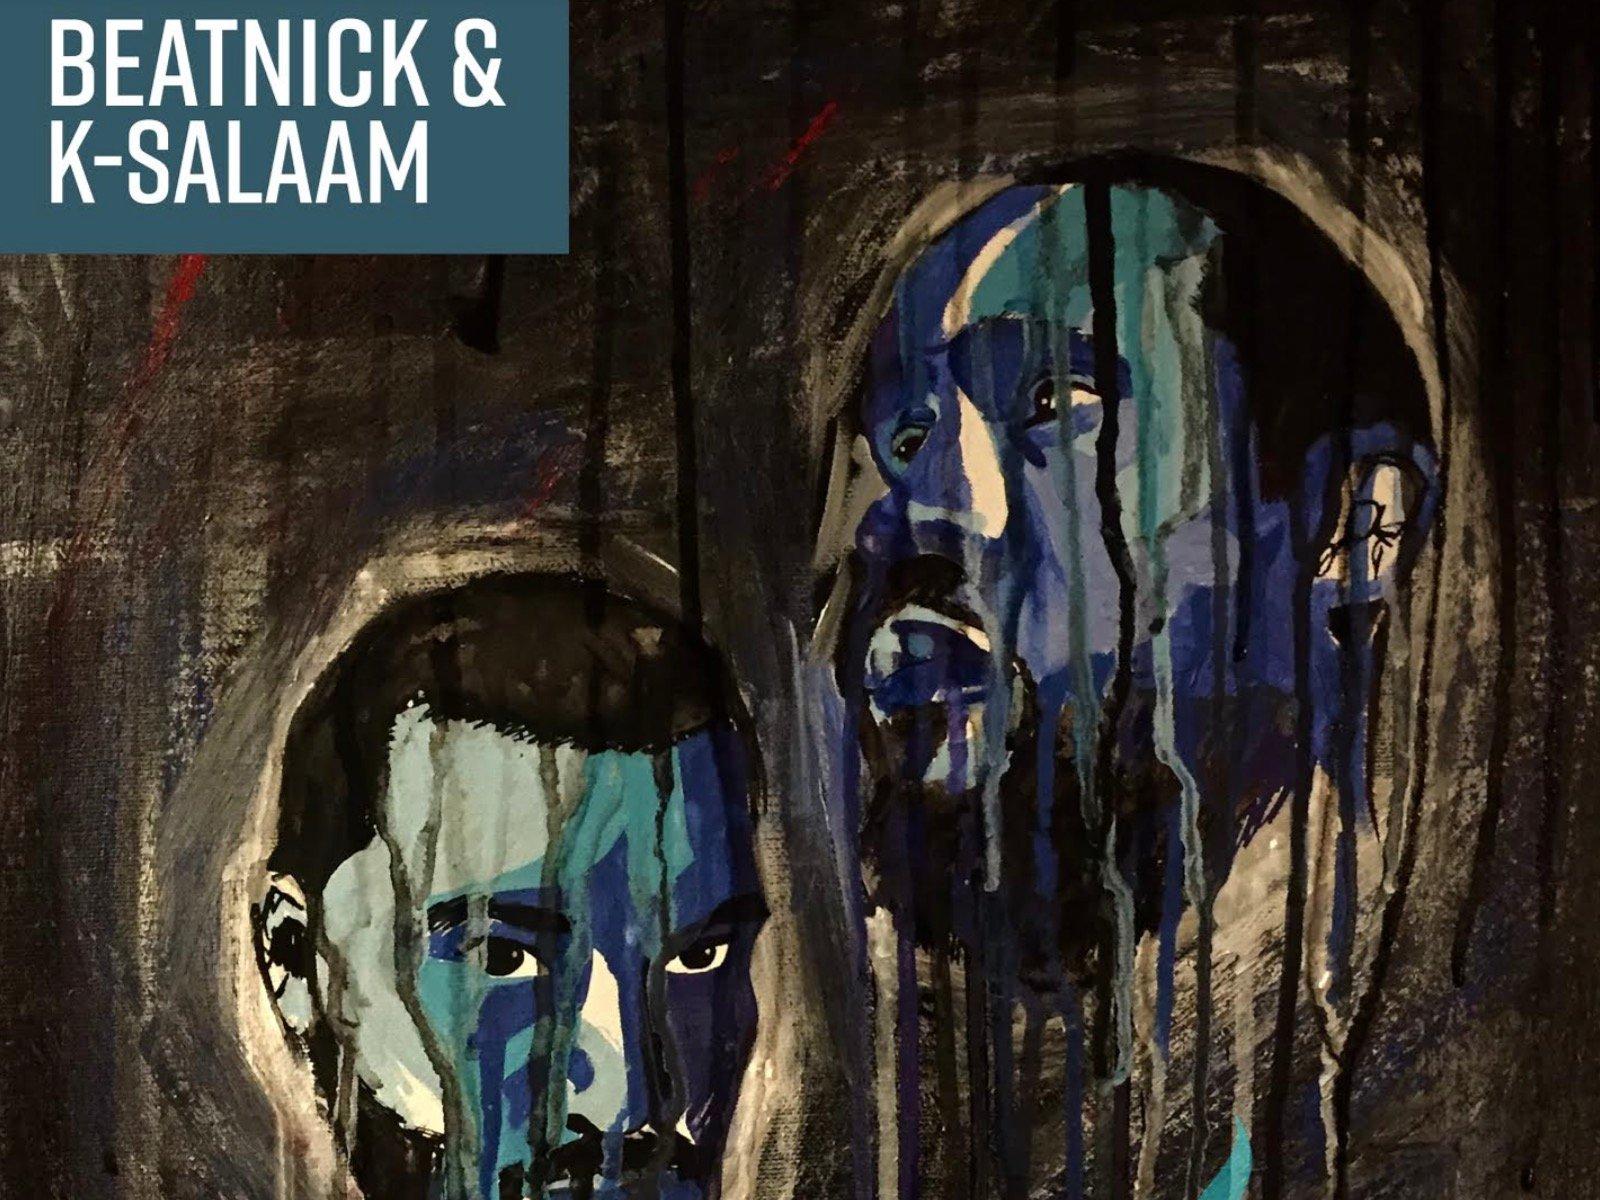 Beatnick and K-Salaam